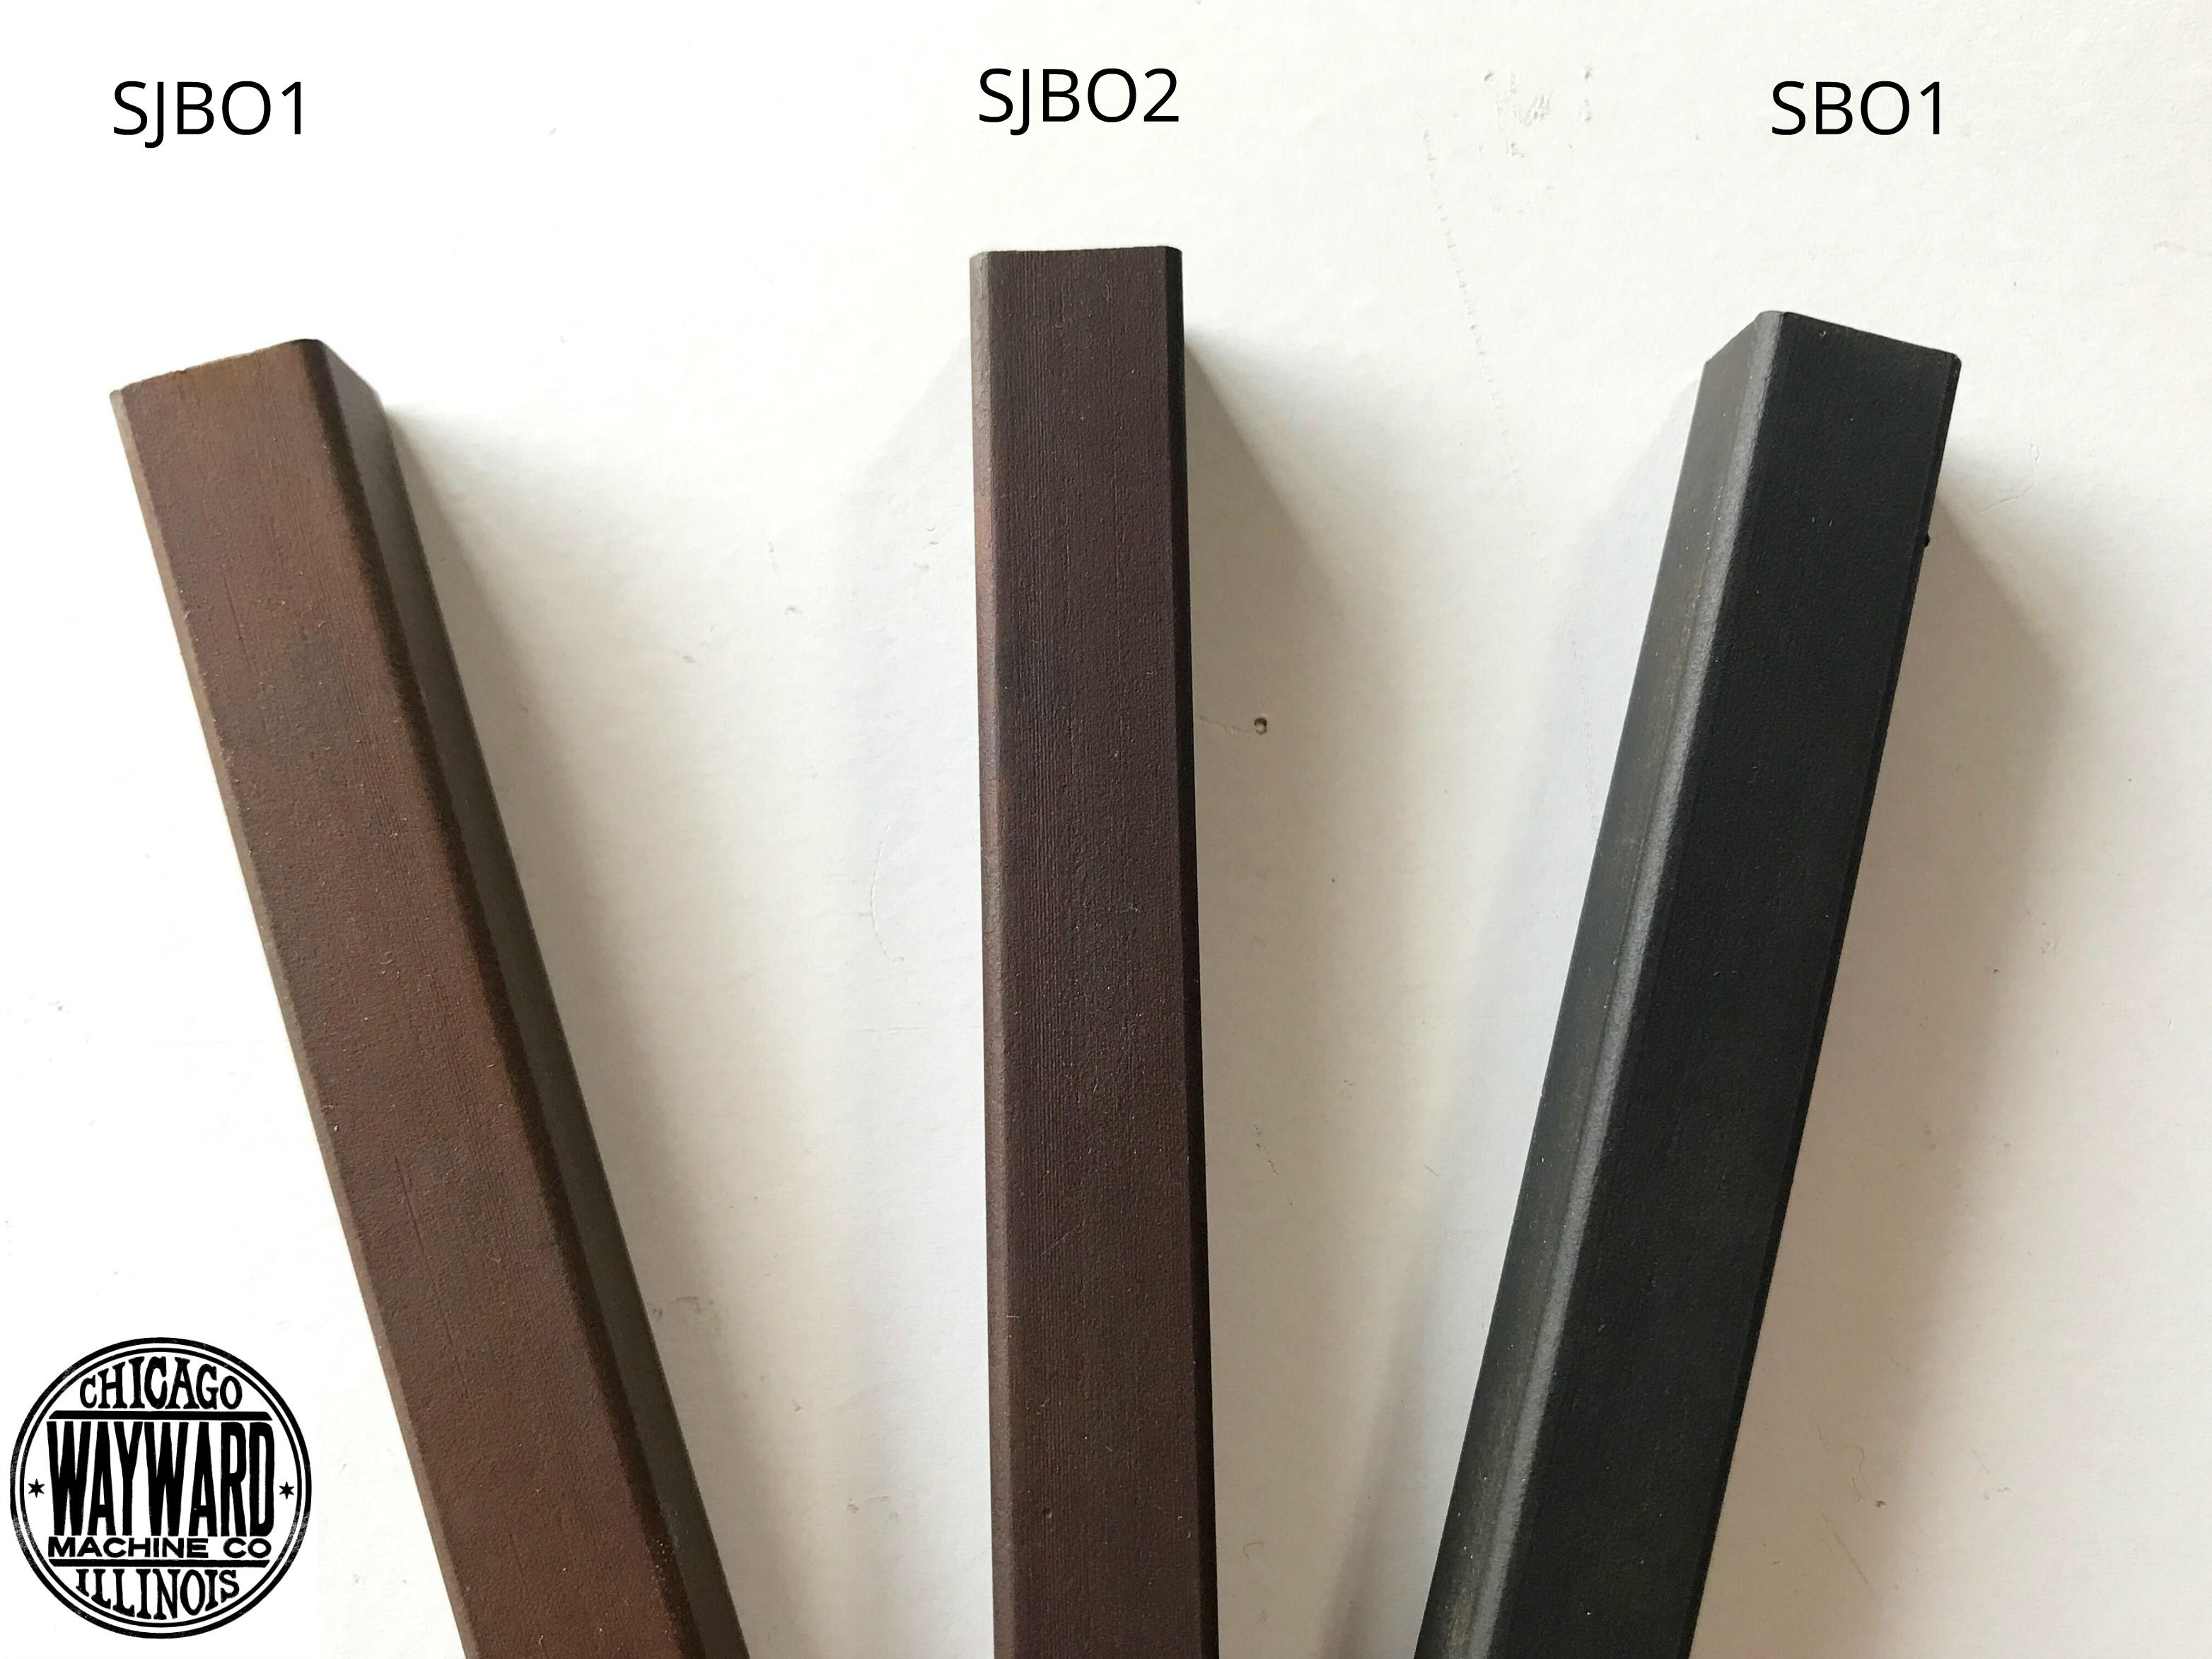 Japanese Brown Finish On Steel Blackened Steel Finish Wayward